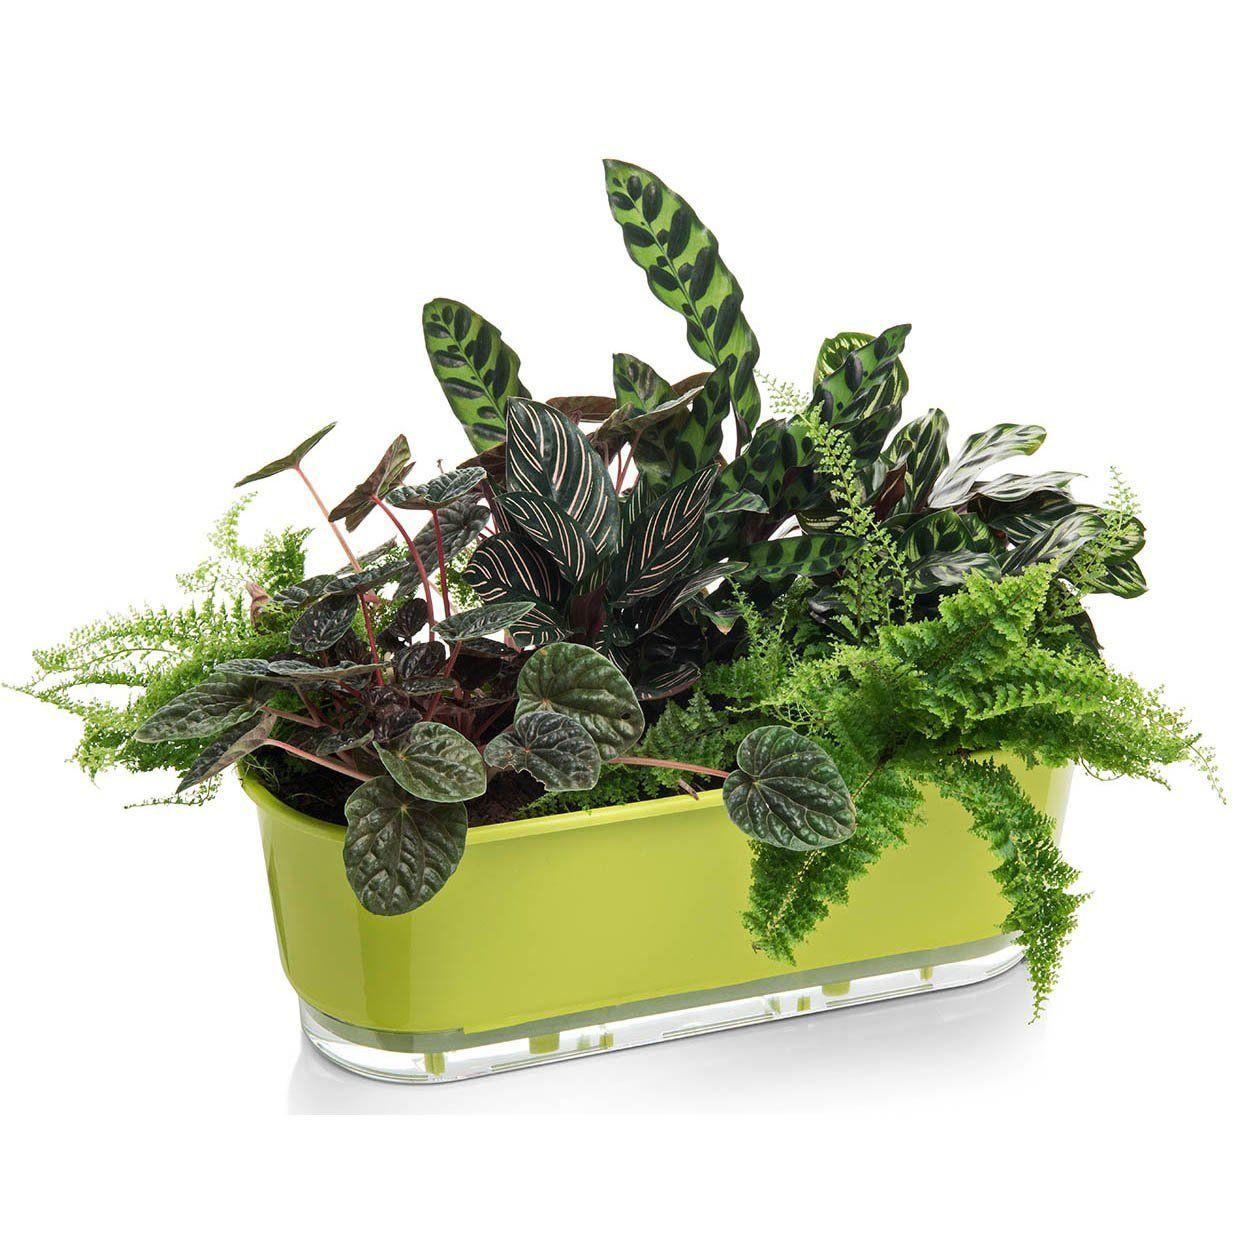 Jardineira Autoirrigável Verde Claro 40cm  - Vasos Raiz Loja Oficial